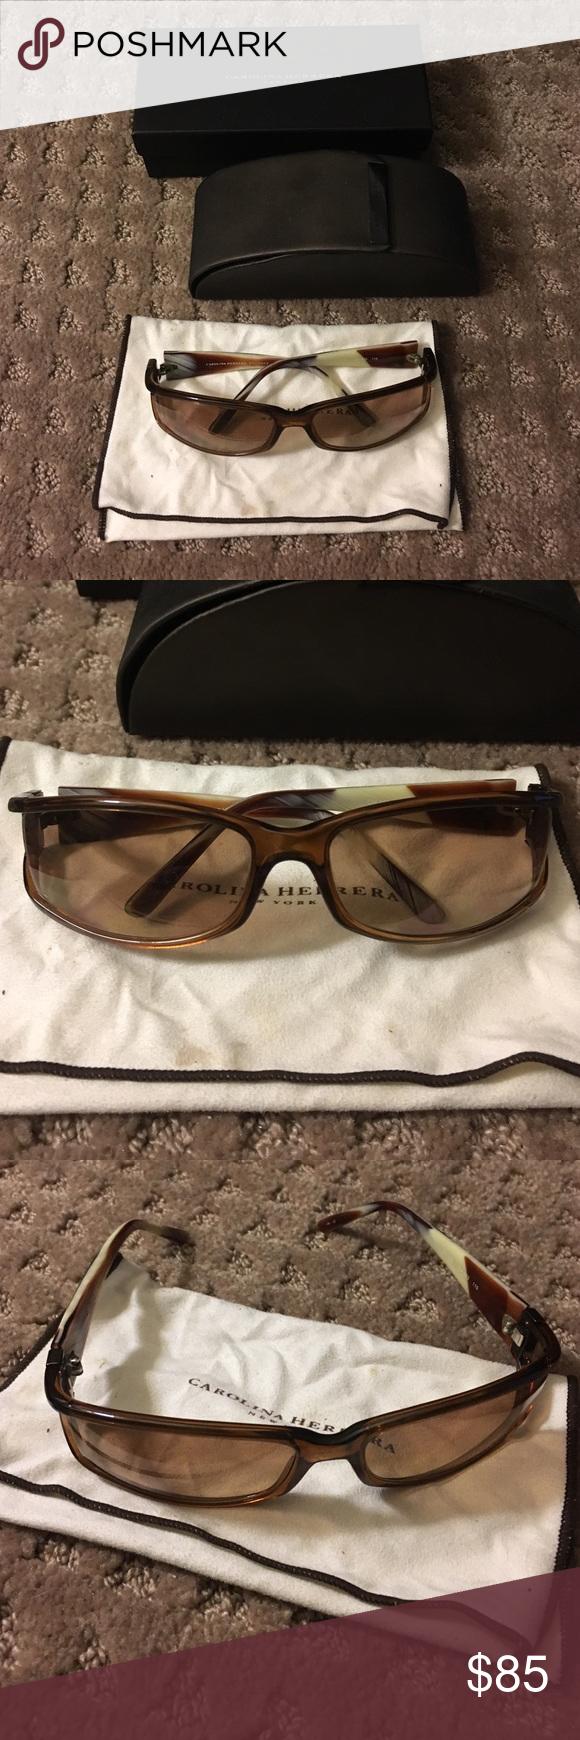 dd1b4f1ad146 Carolina Herrera CH-159 Sunglasses Chestnut REAL Carolina hererra sunglasses